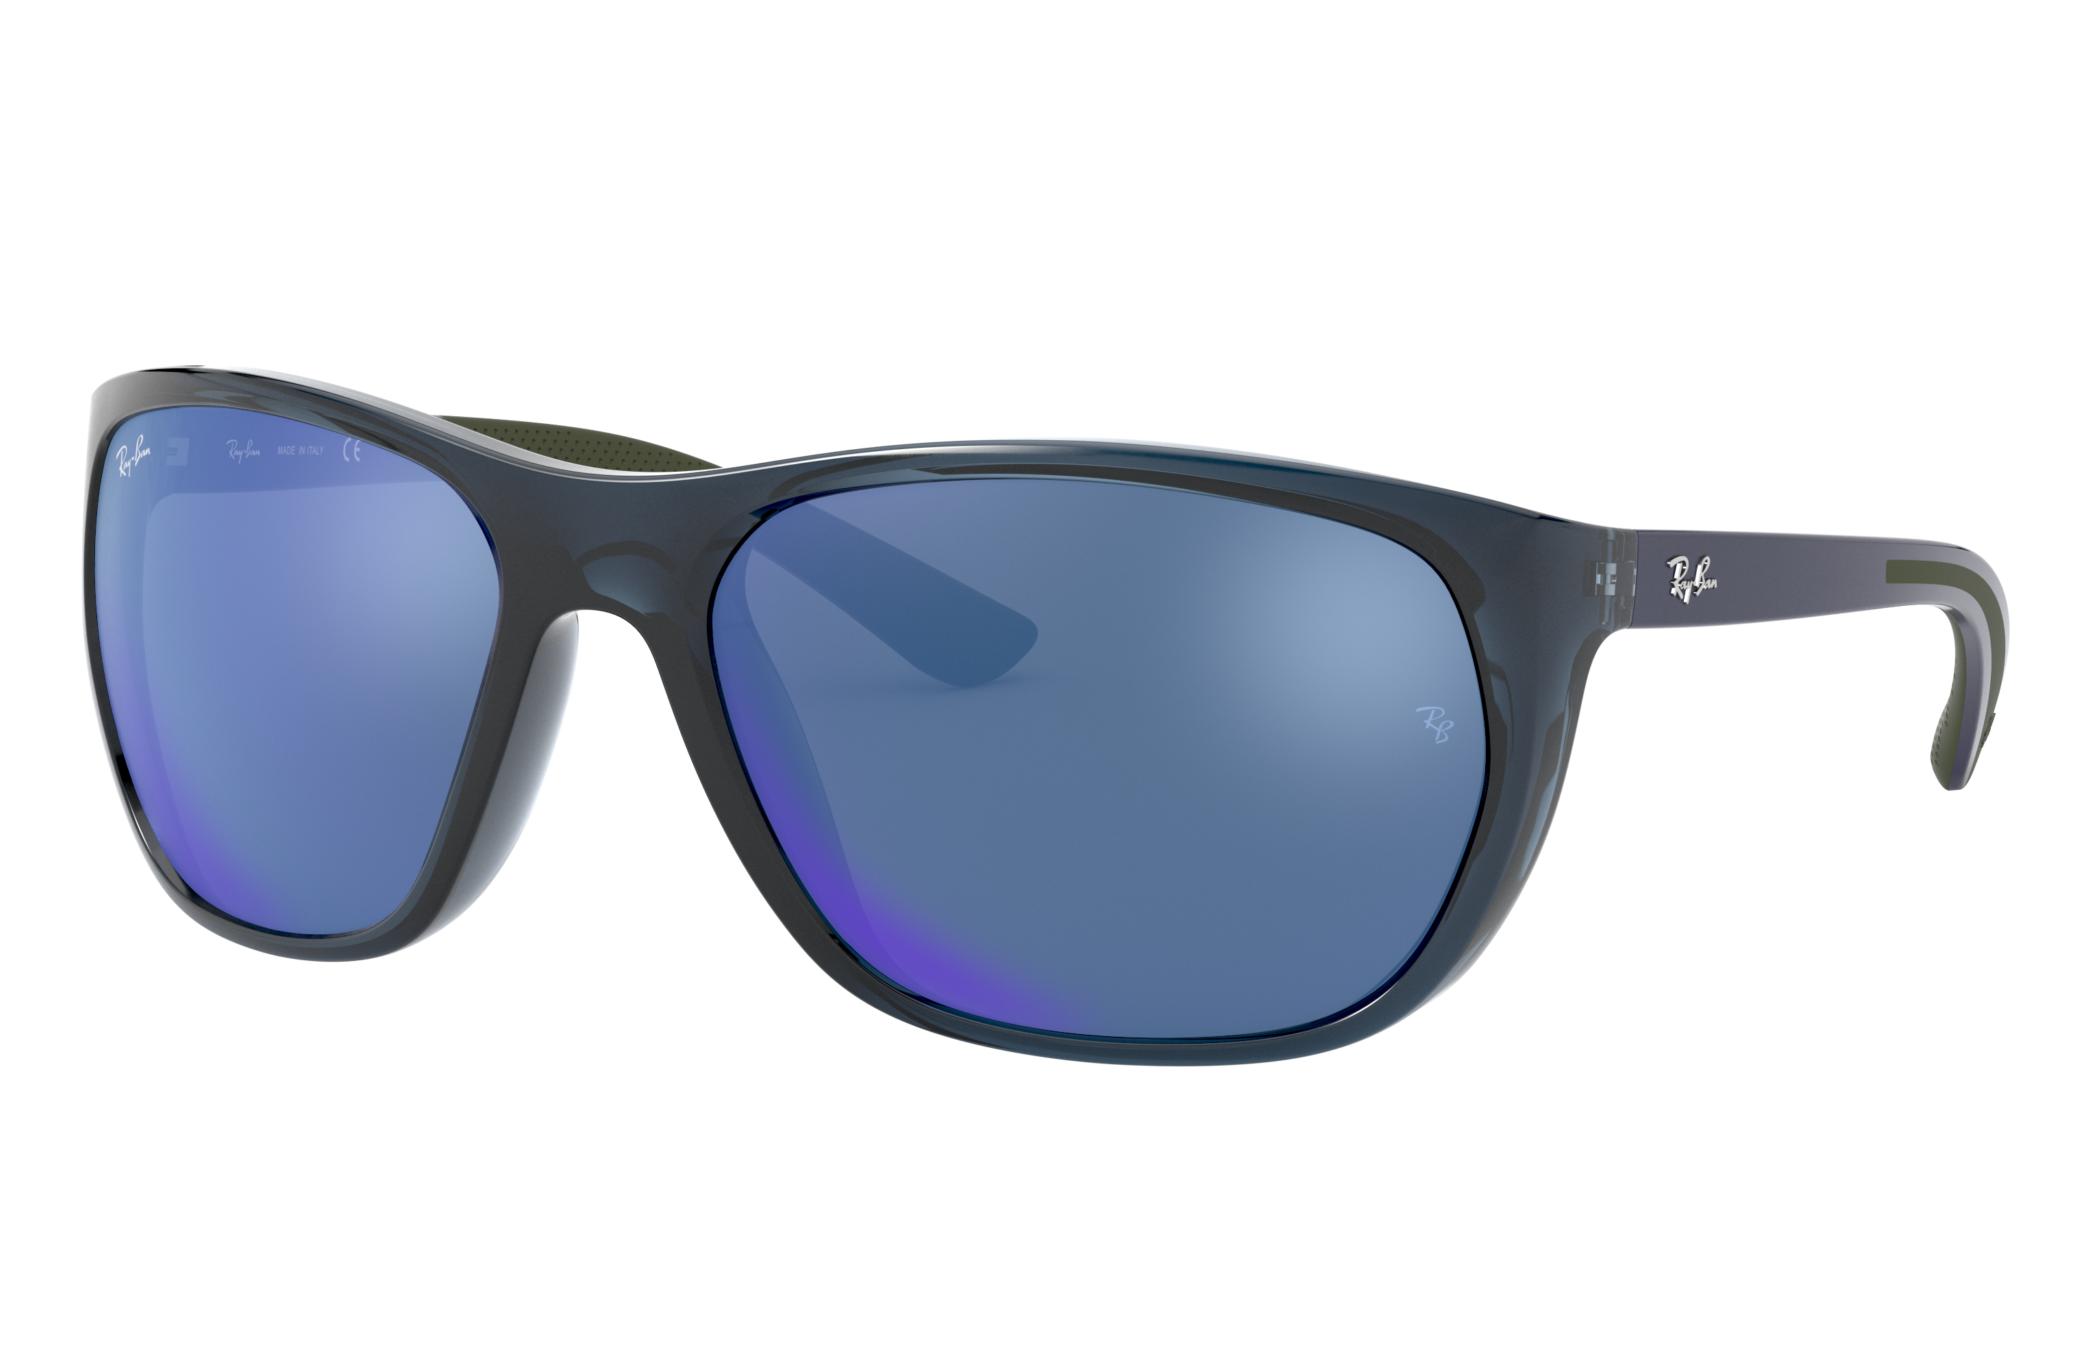 Ray-Ban Rb4307 Blue, Blue Lenses - RB4307